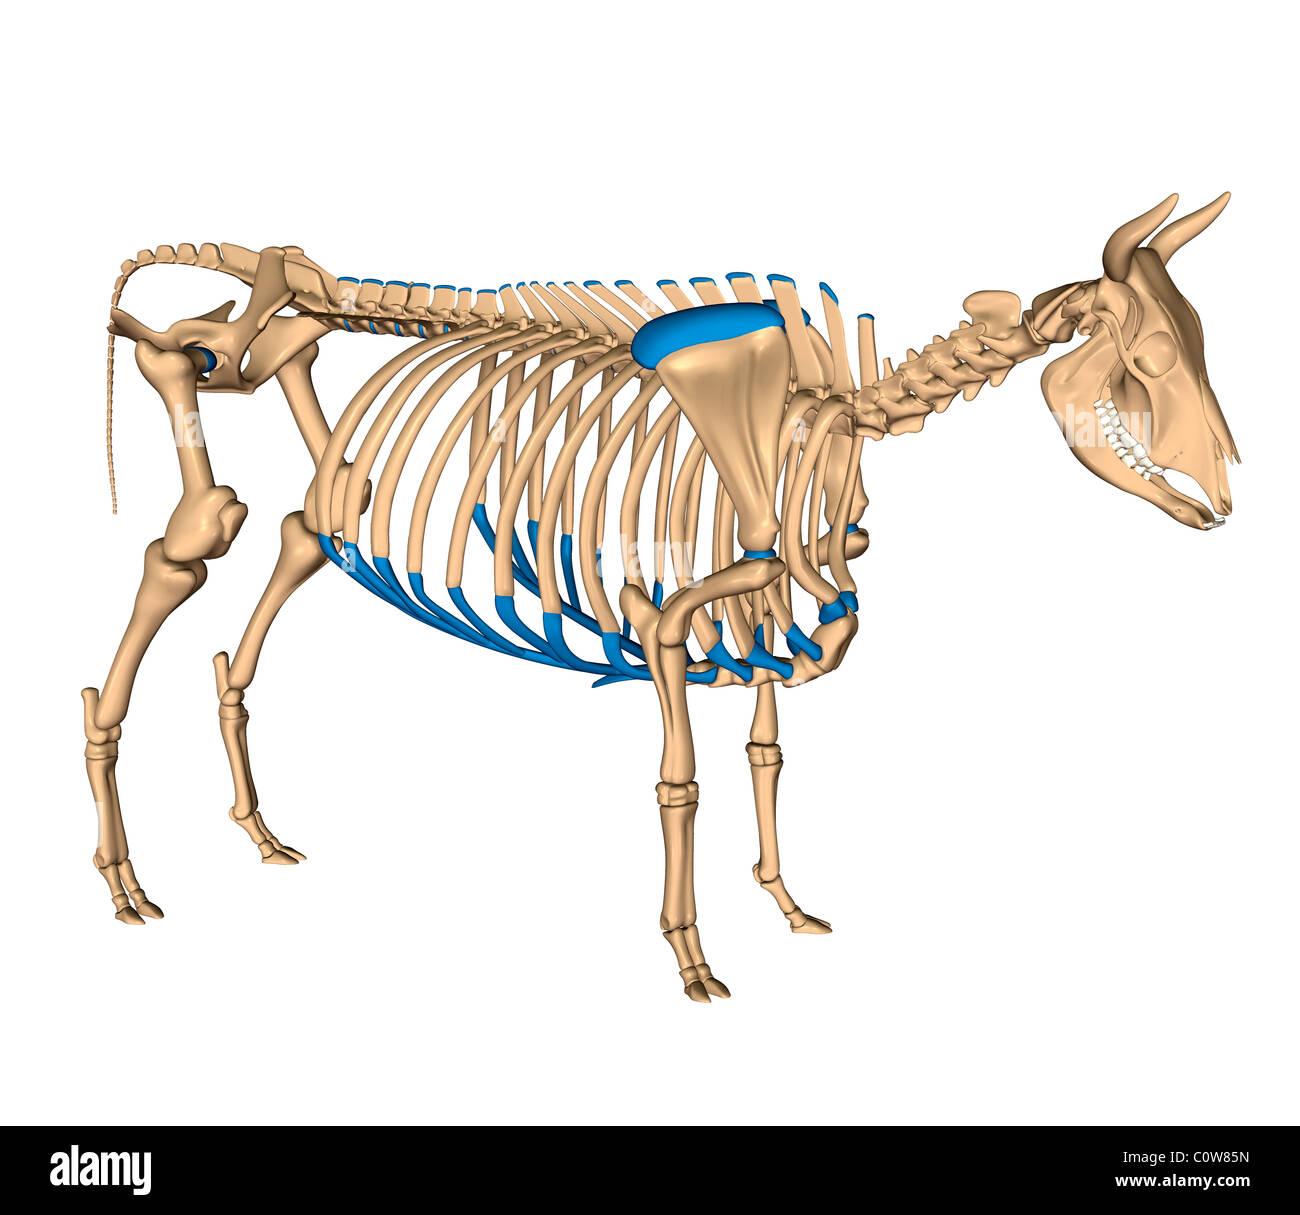 Anatomy Of The Cow Skeleton Stock Photo 34975969 Alamy